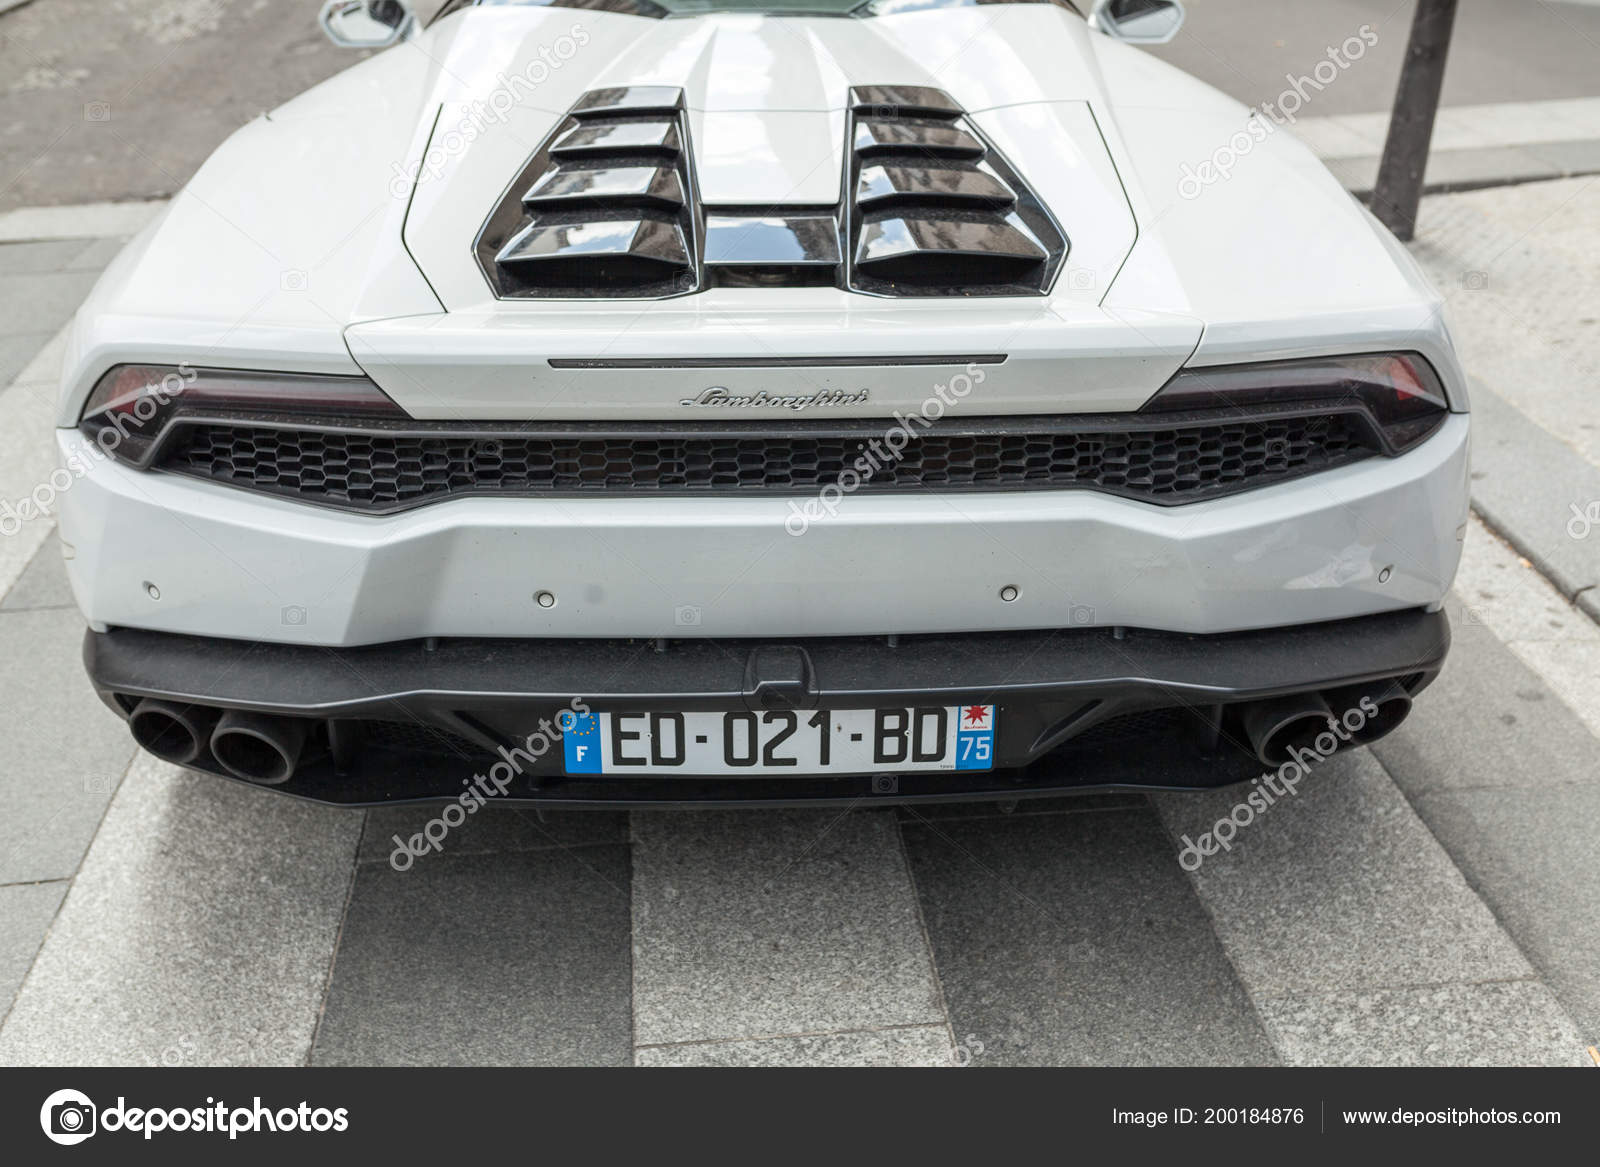 Paris France June 2018 White Lamborghini Rear View Parking Street